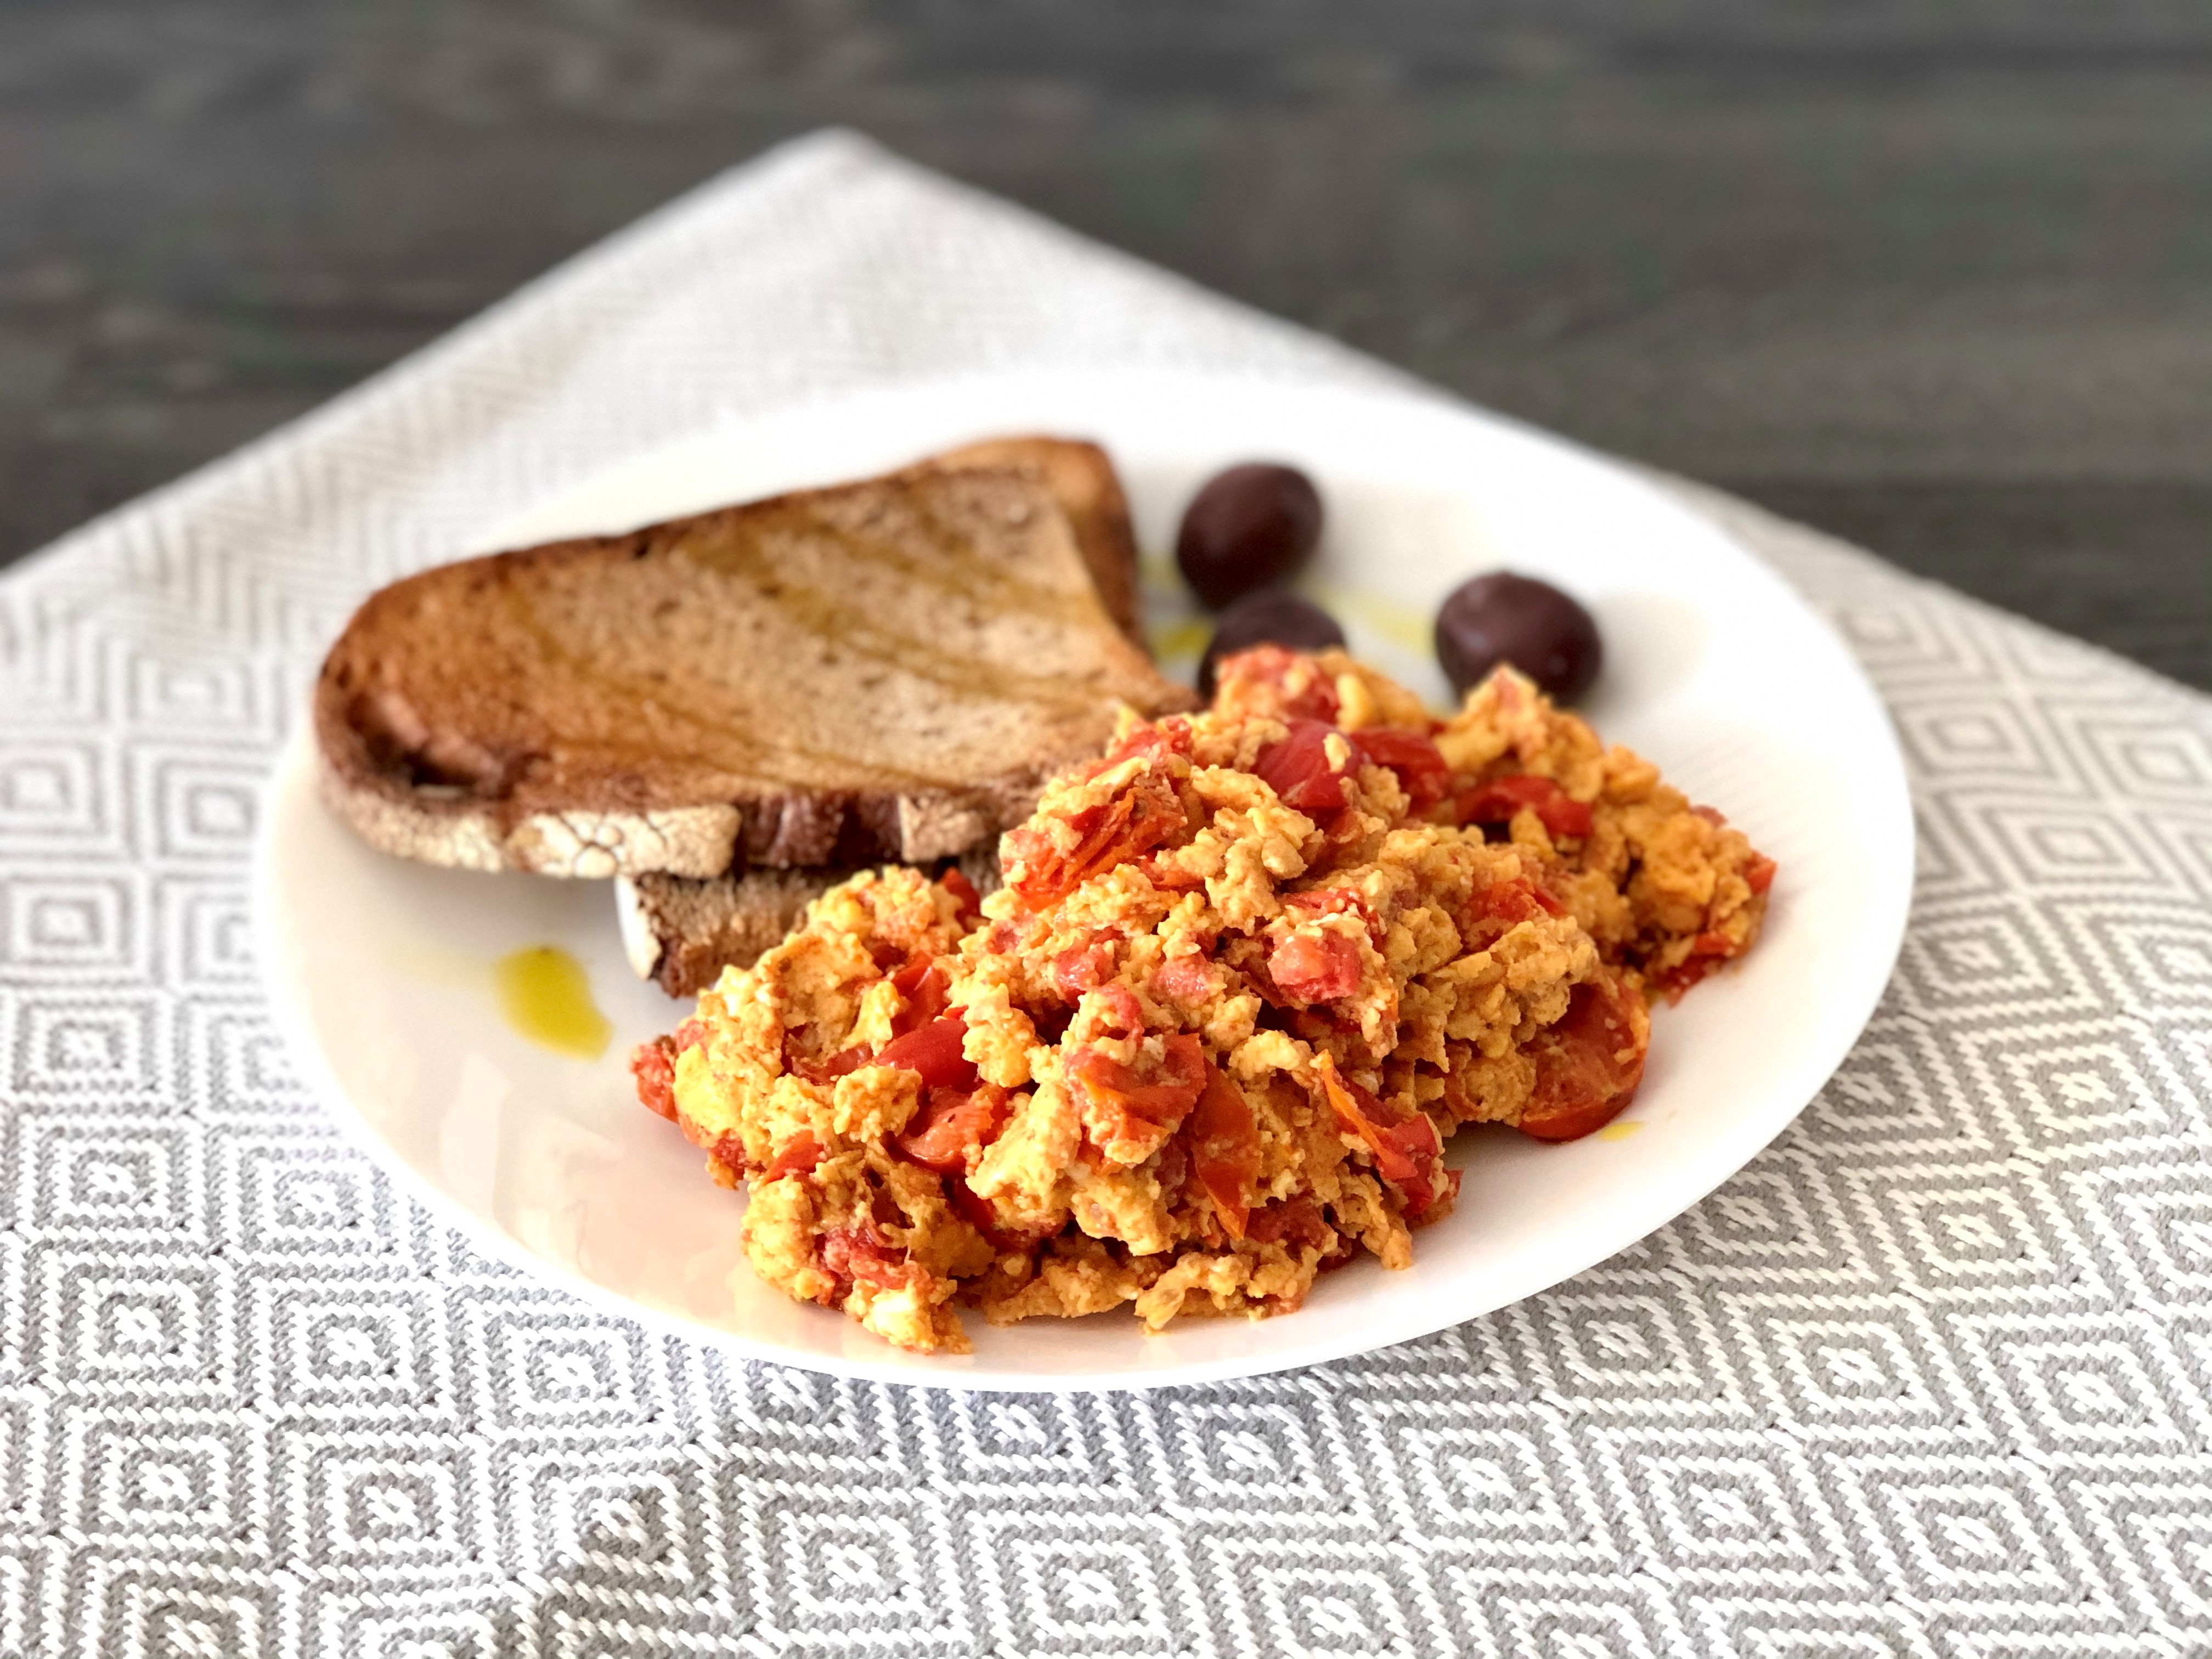 Spanish Chorizo and Tomato Scrambled Eggs